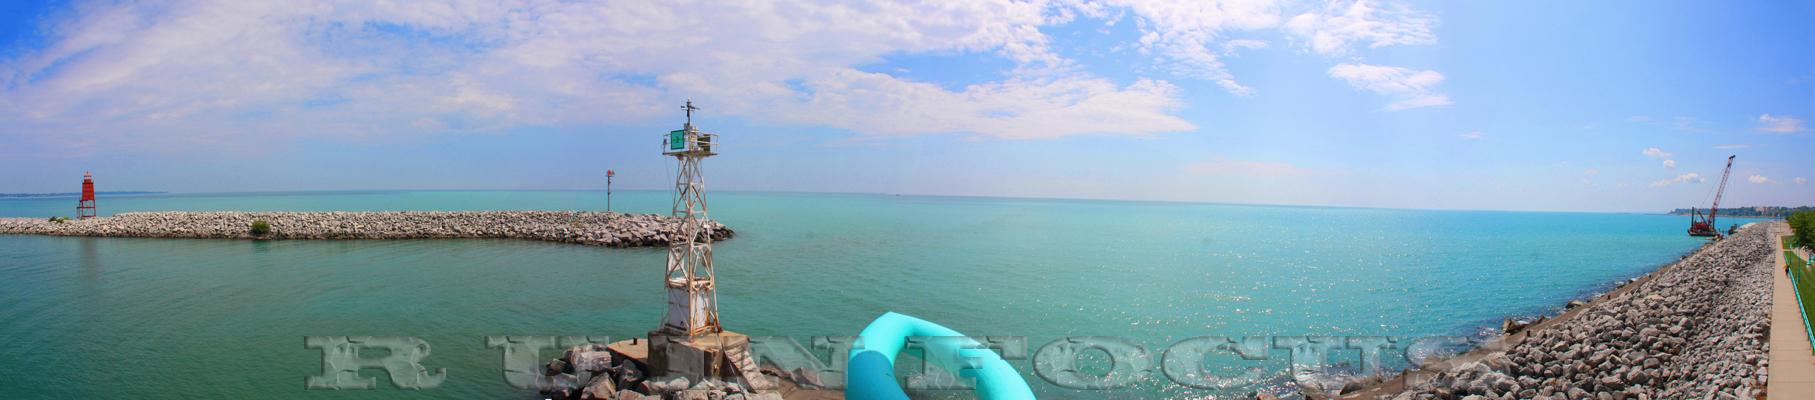 lake-michigansw-_panorama1